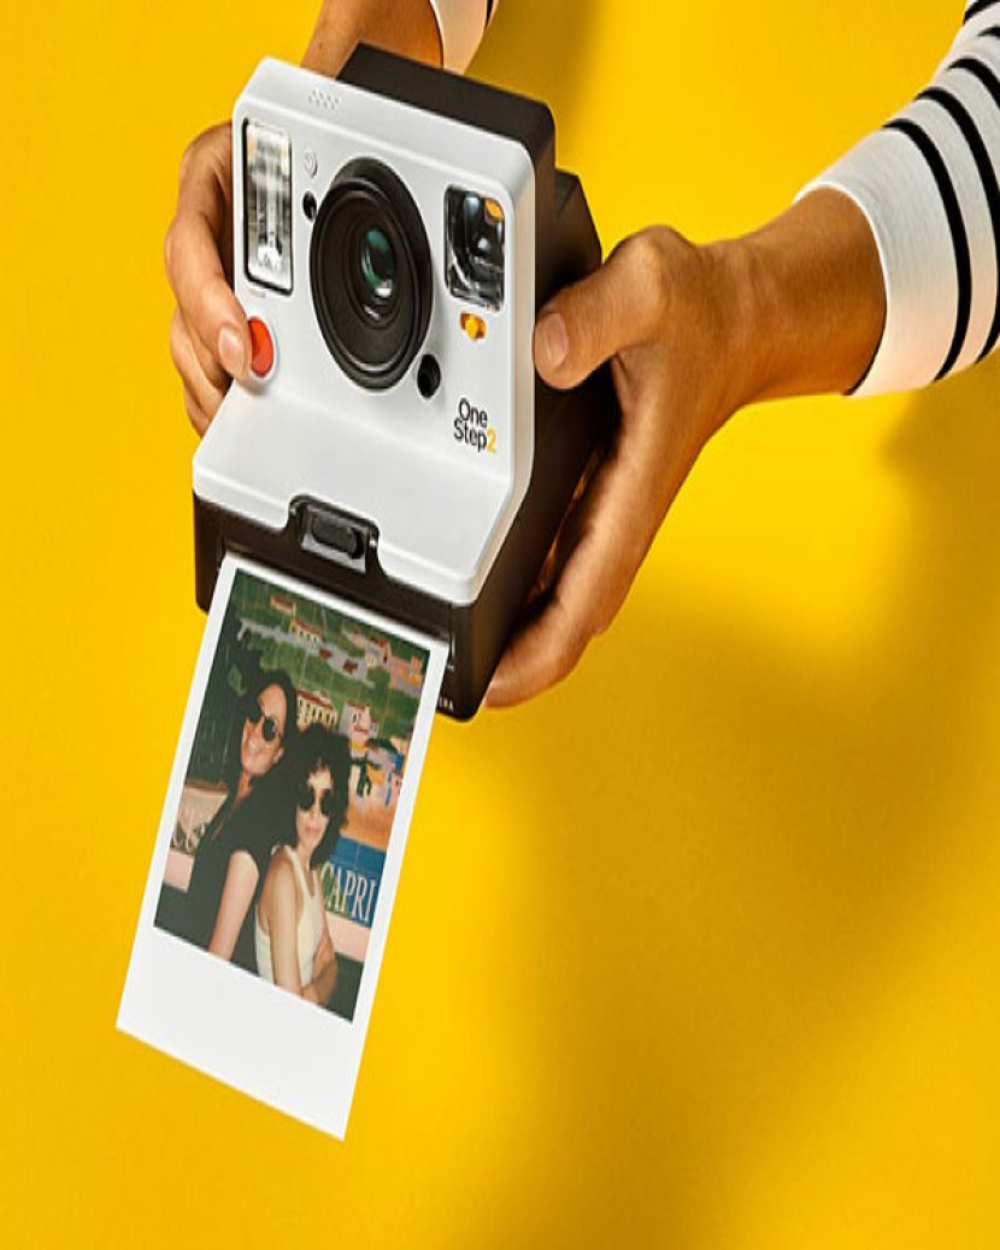 Polaroid OneStep 2: Η επιστροφή της εταιρείας με μια νέα φωτογραφική μηχανή στιγμιαίας εκτύπωσης [Videos]